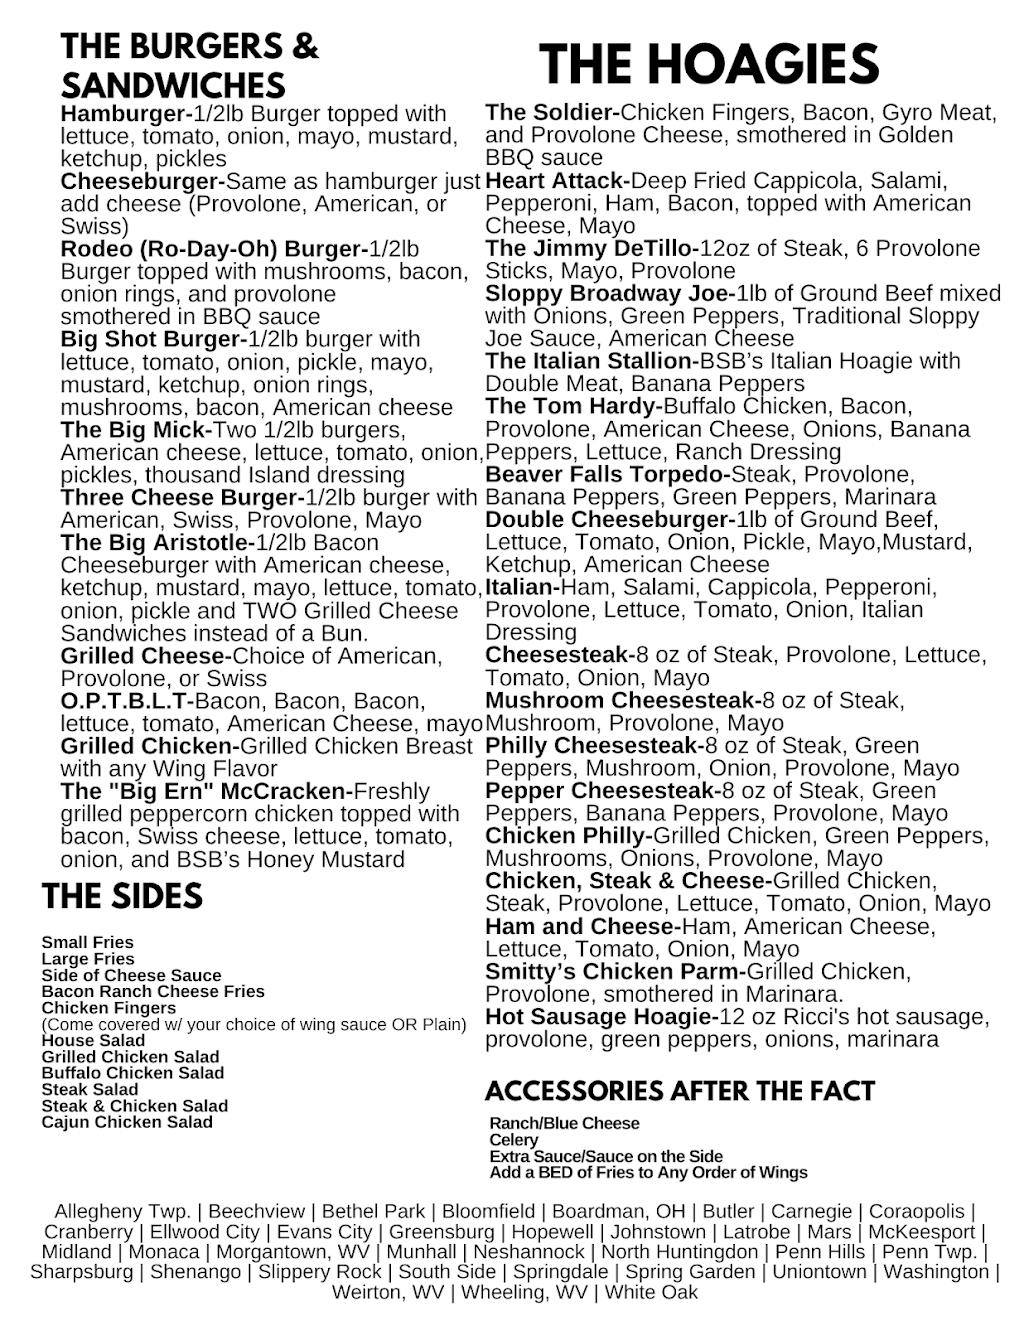 Big Shot Bobs House of Wings - Latrobe | restaurant | 702 Industrial Blvd, Latrobe, PA 15650, USA | 7245204450 OR +1 724-520-4450